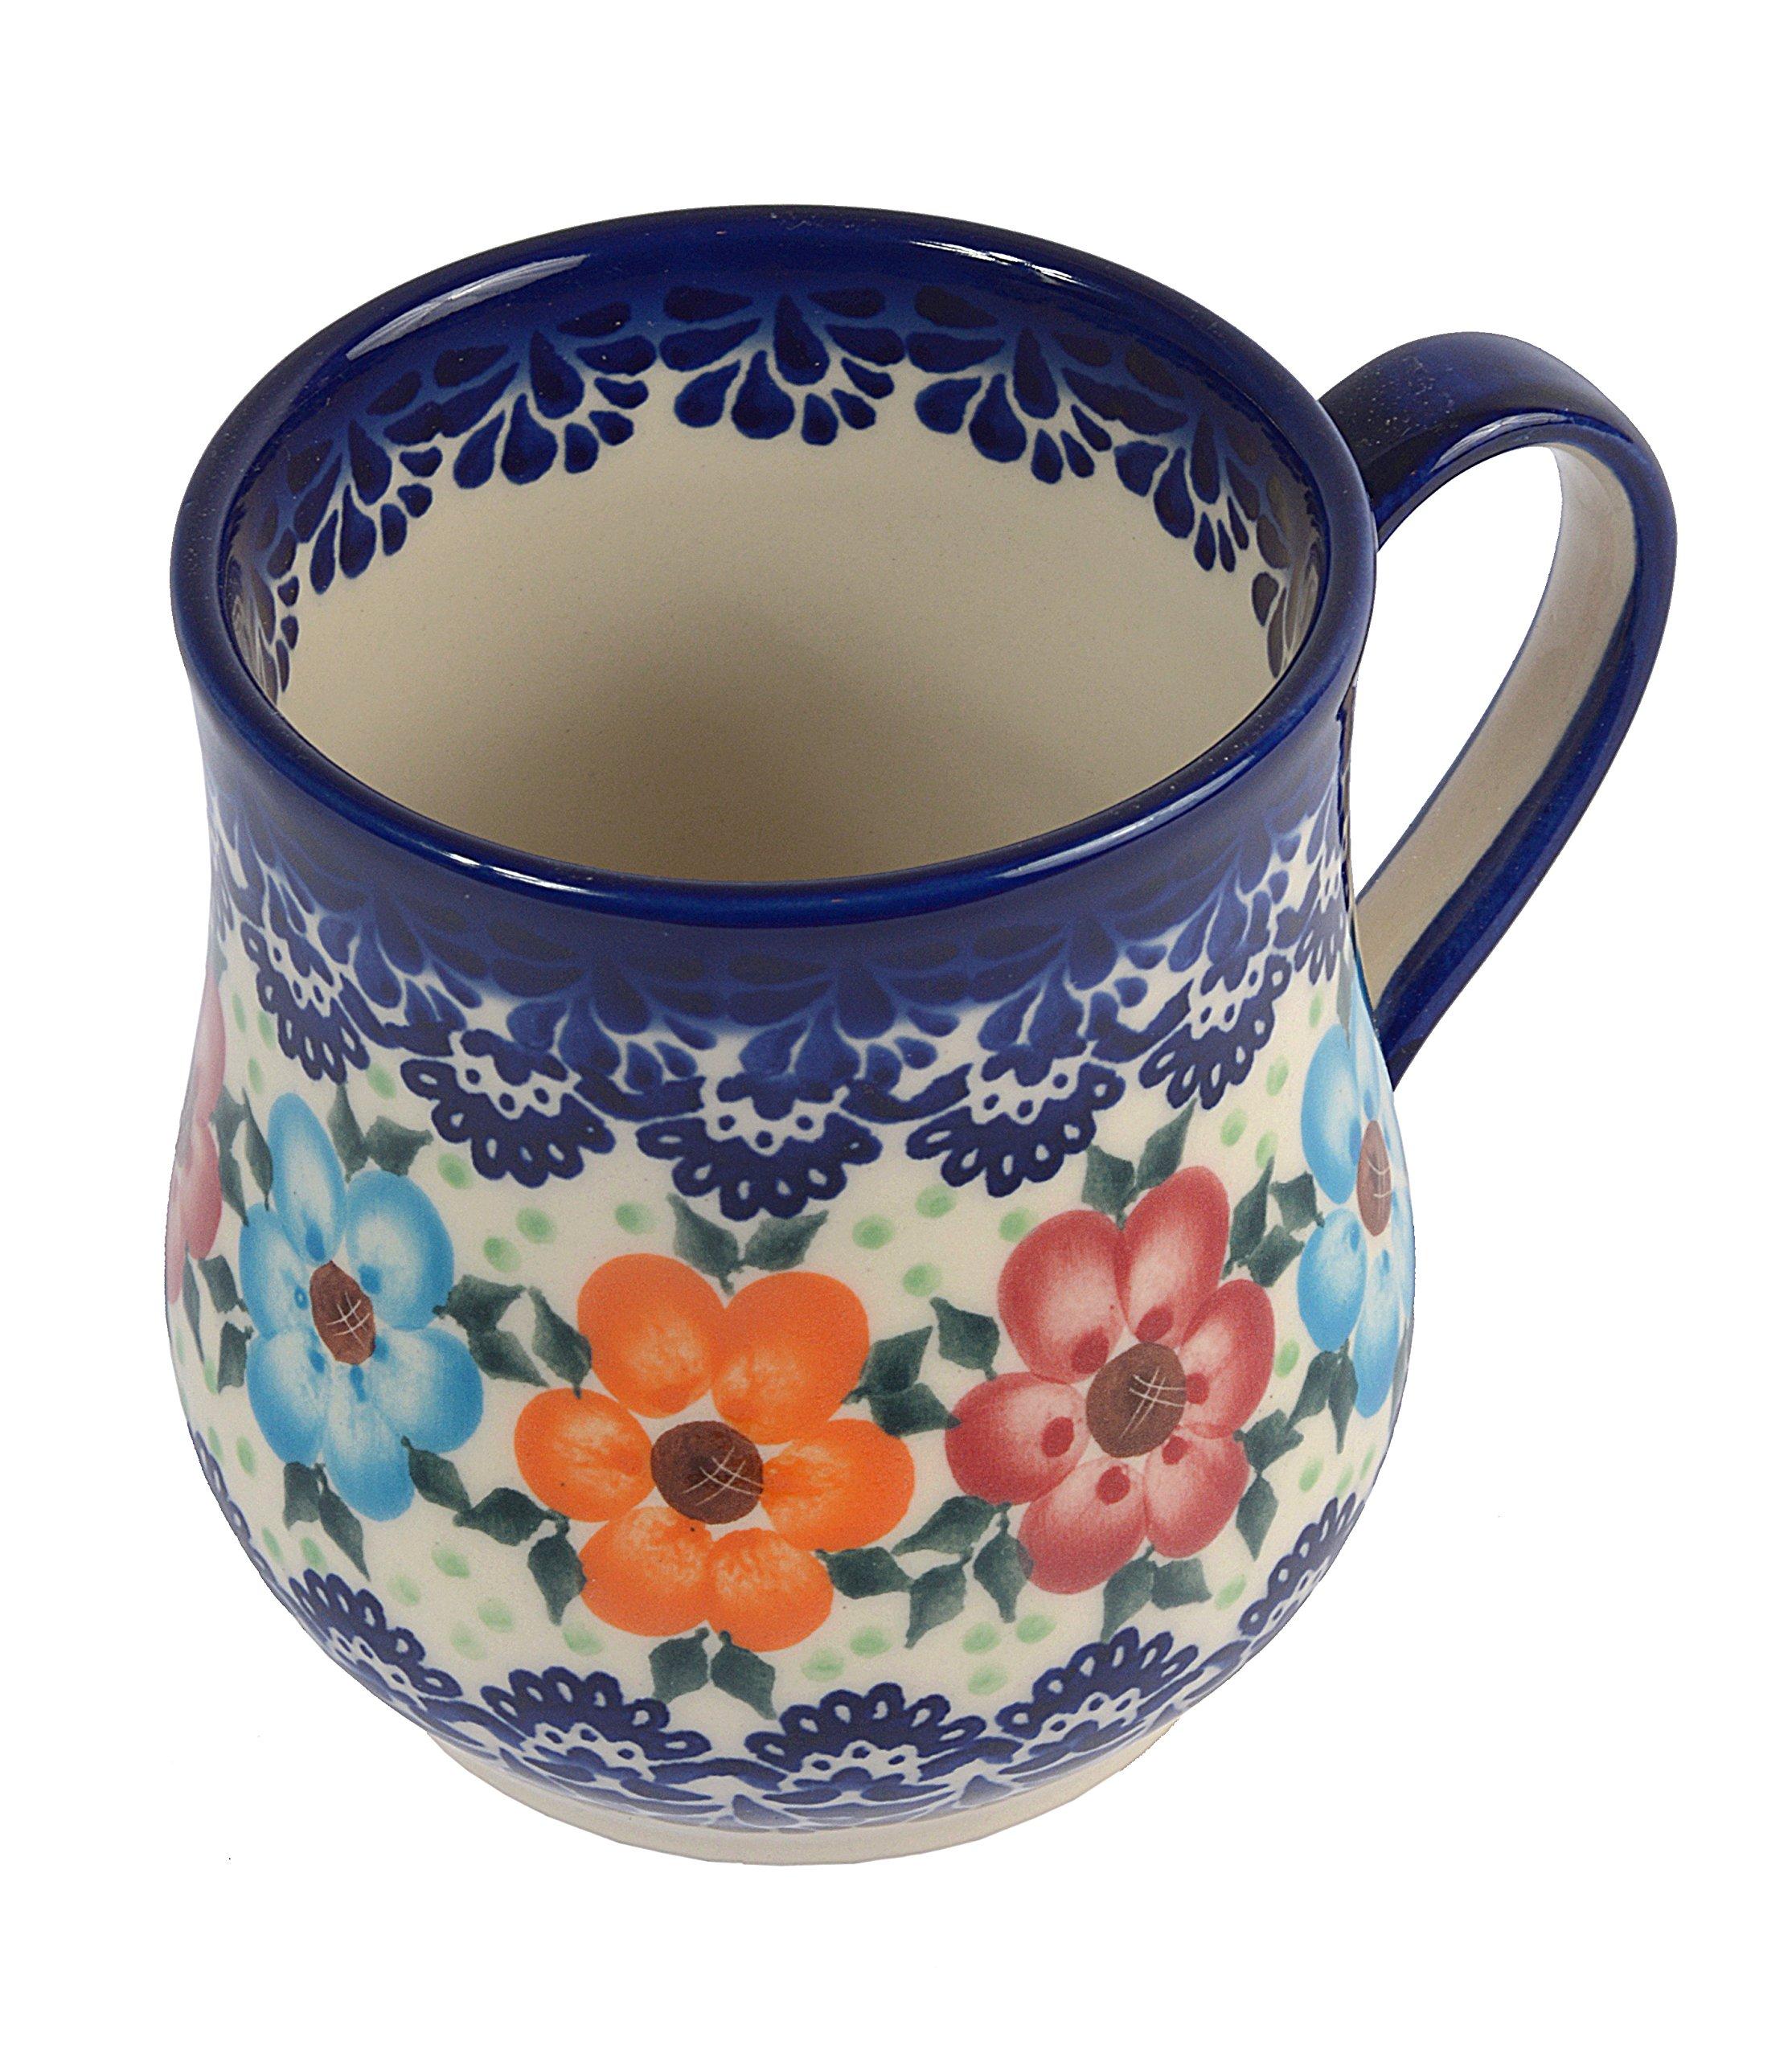 Traditional Polish Pottery, Handcrafted Ceramic Drop-shaped Mug (350 ml /12.3 fl oz), Boleslawiec Style Pattern, Q.102.BLUELACE